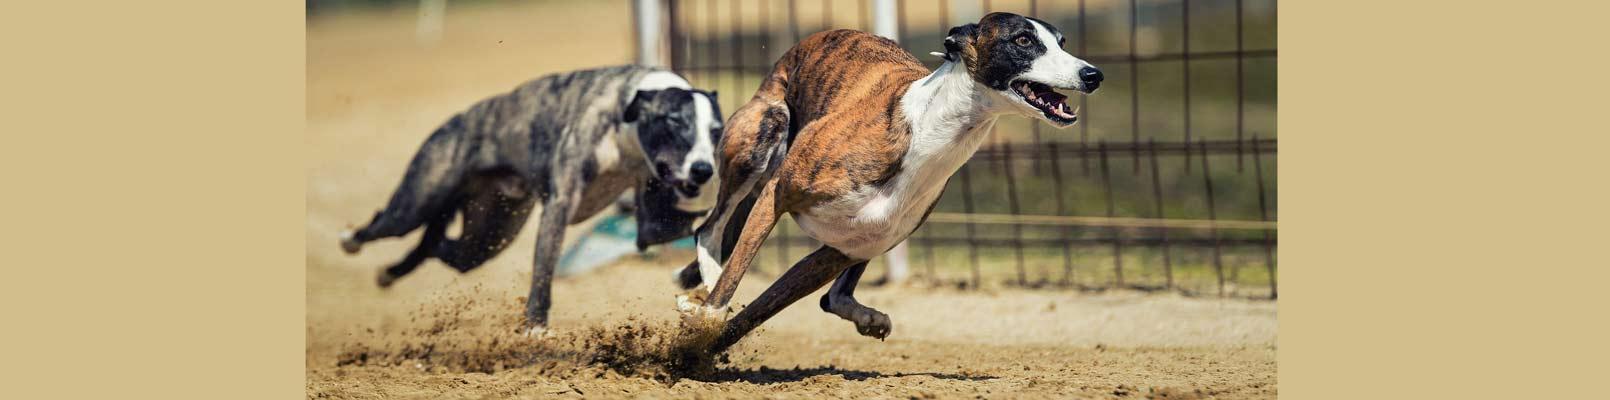 pariuri virtuale pe curse caini